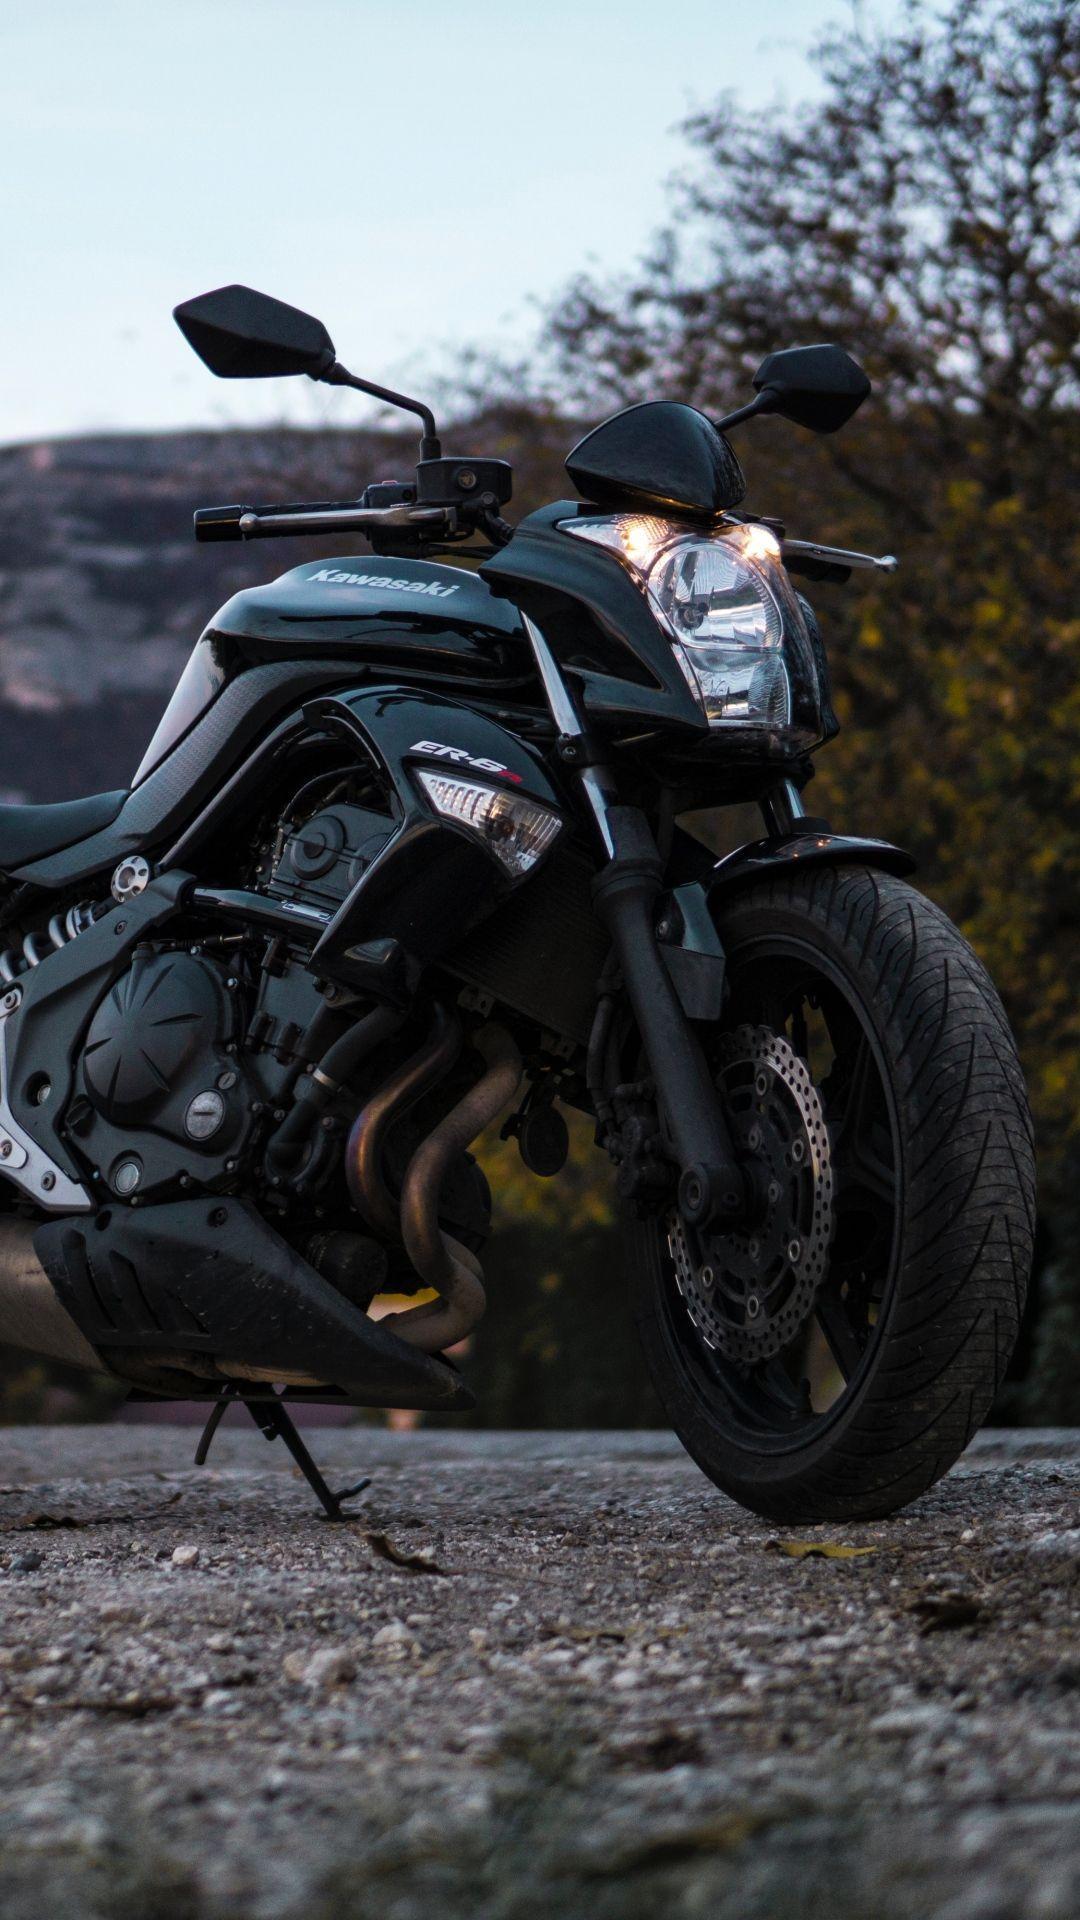 Motorcycle Wallpaper Iphone X